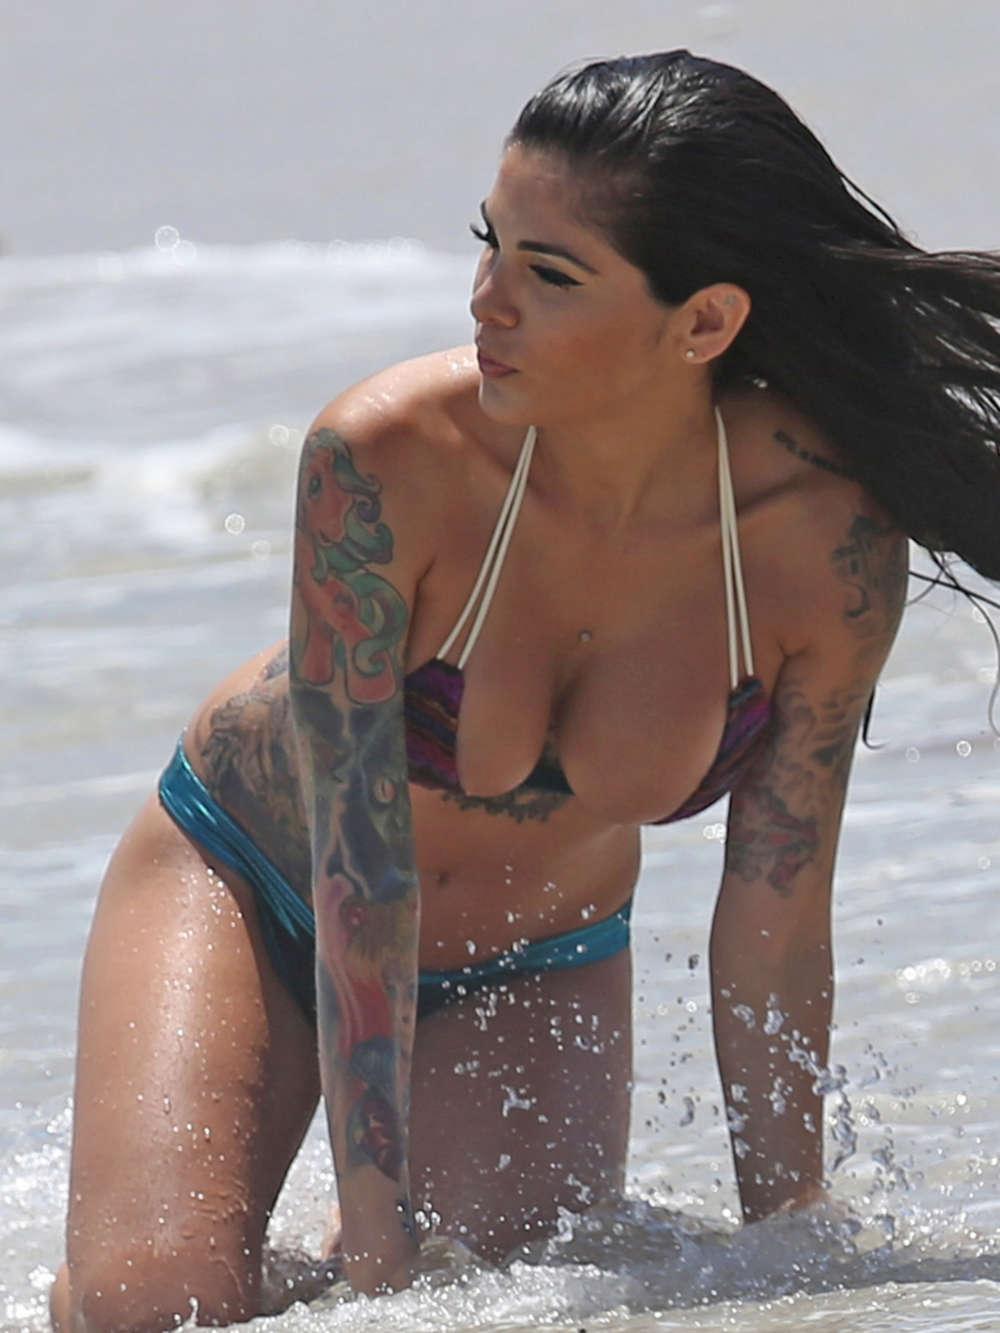 Big butt spread porn sex pics in high quality